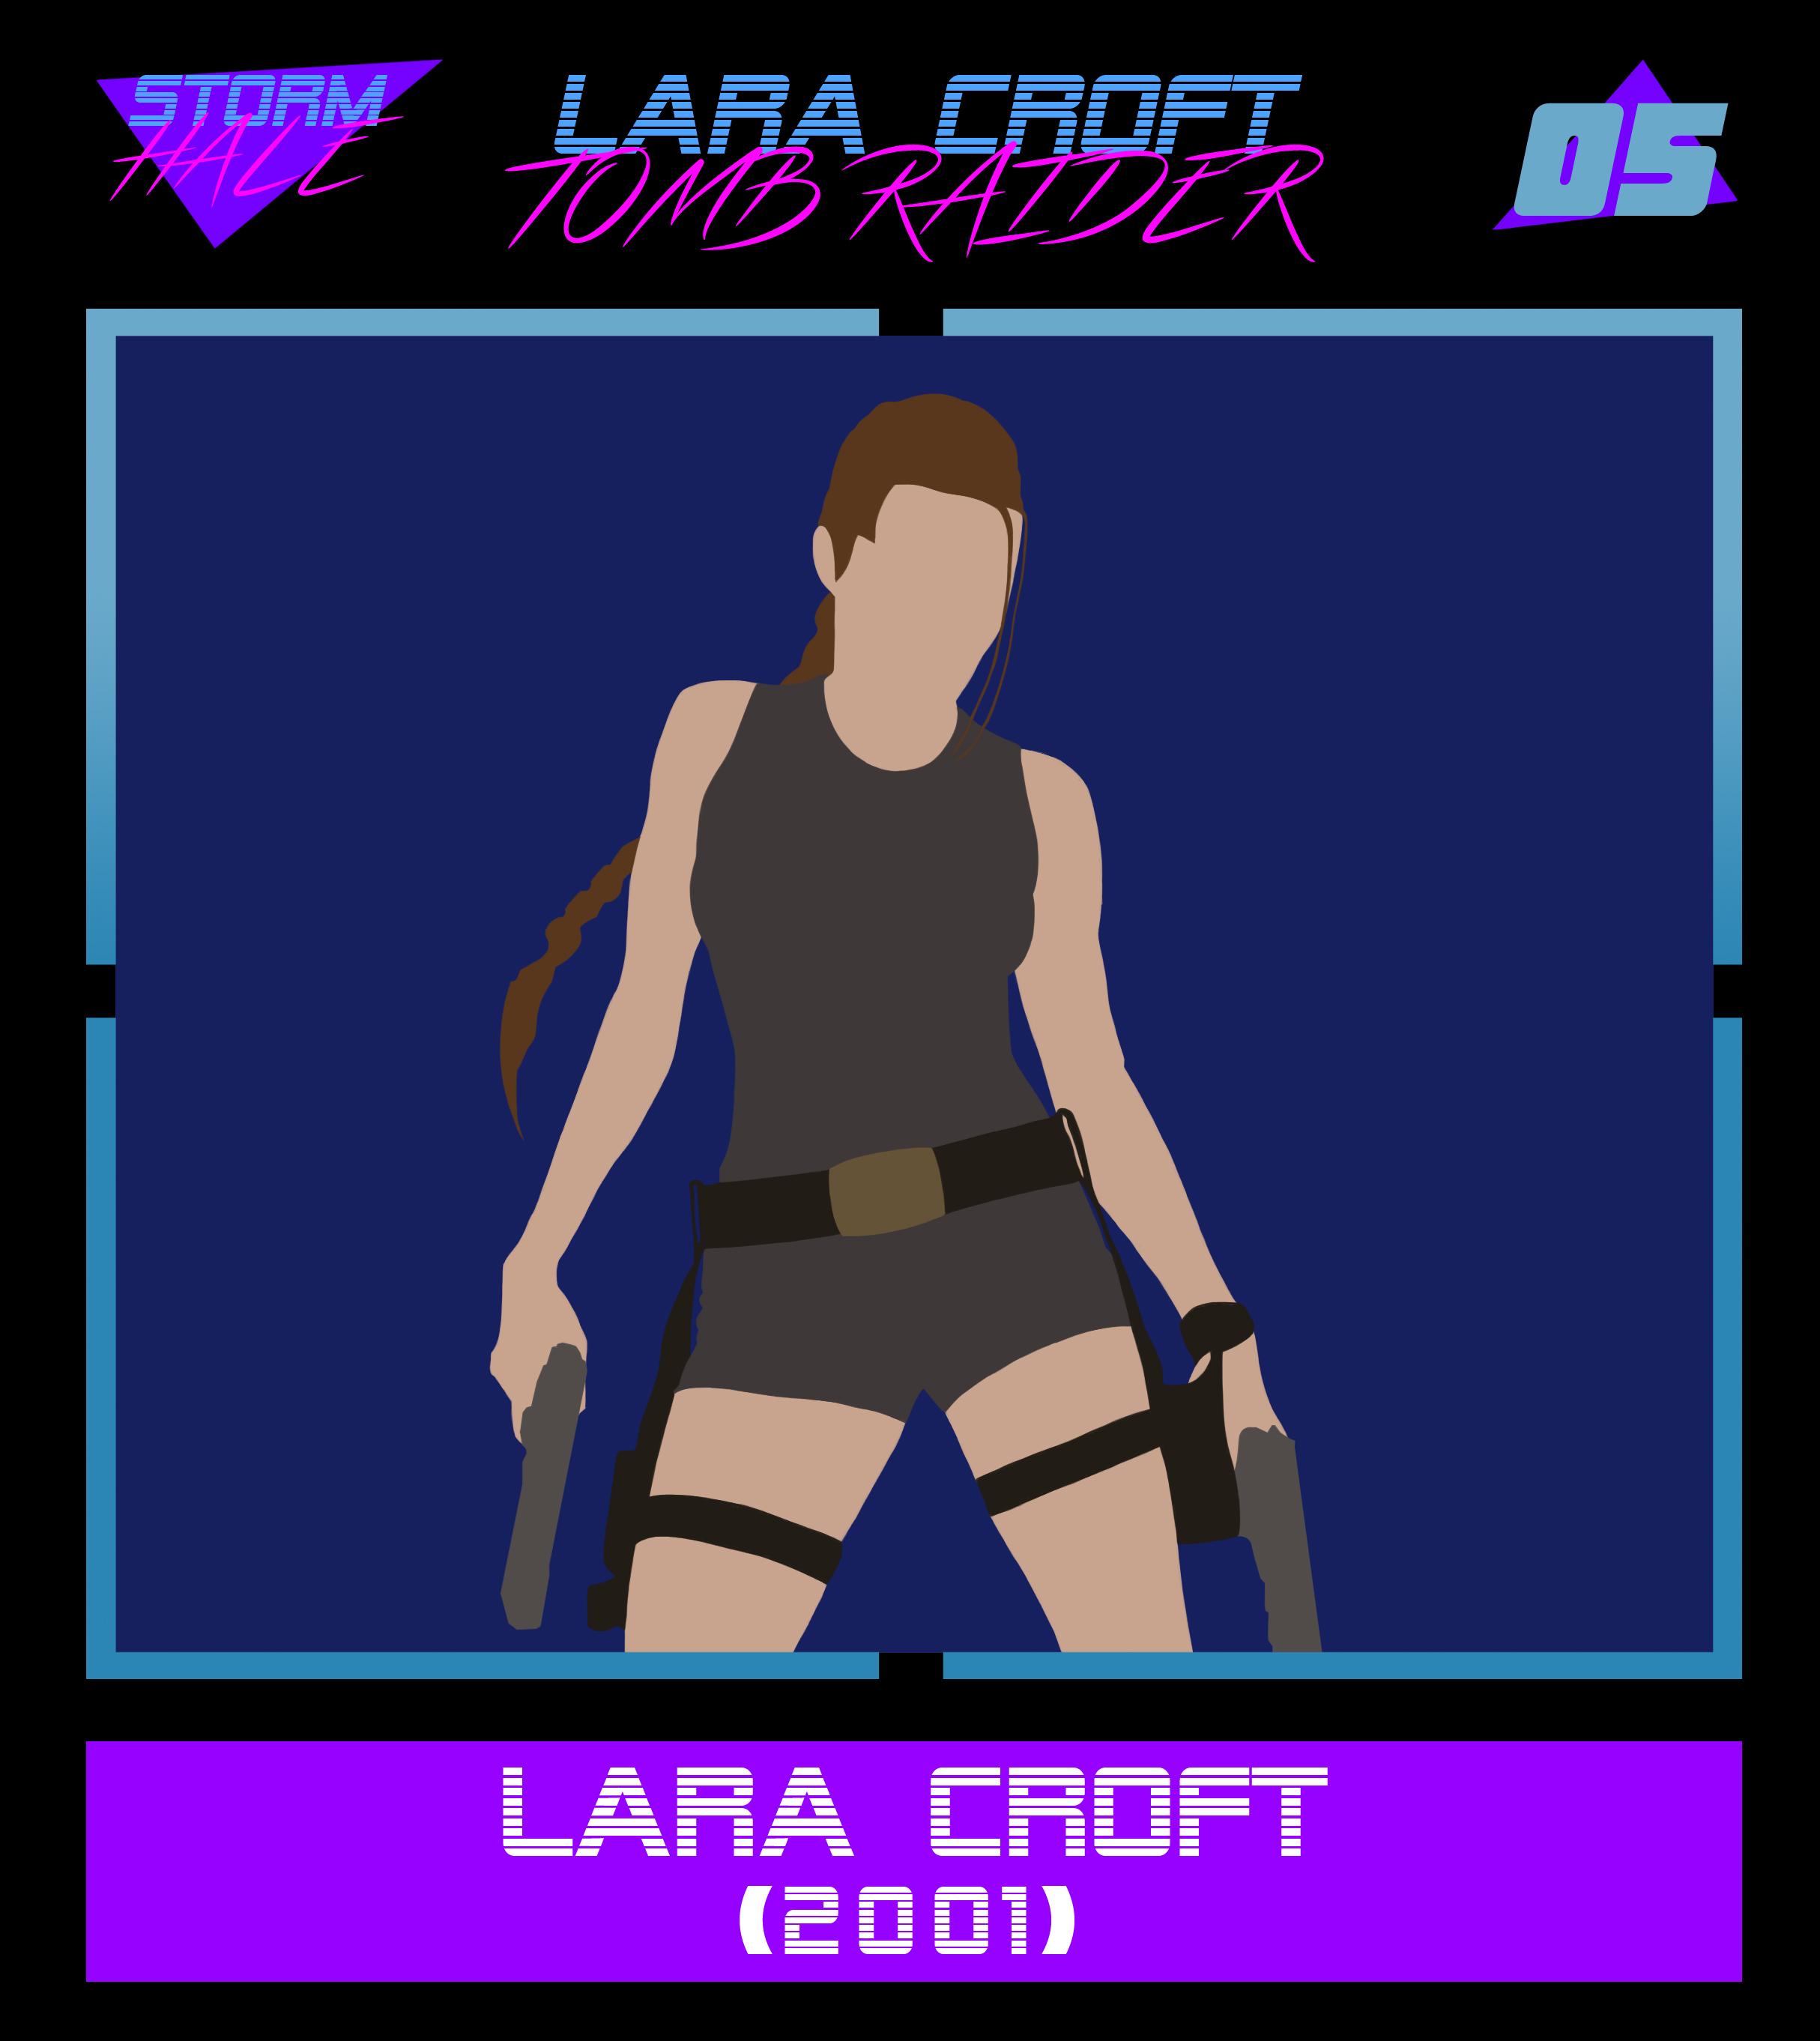 Lara Croft Tomb Raider 2001 By Stormhale On Deviantart